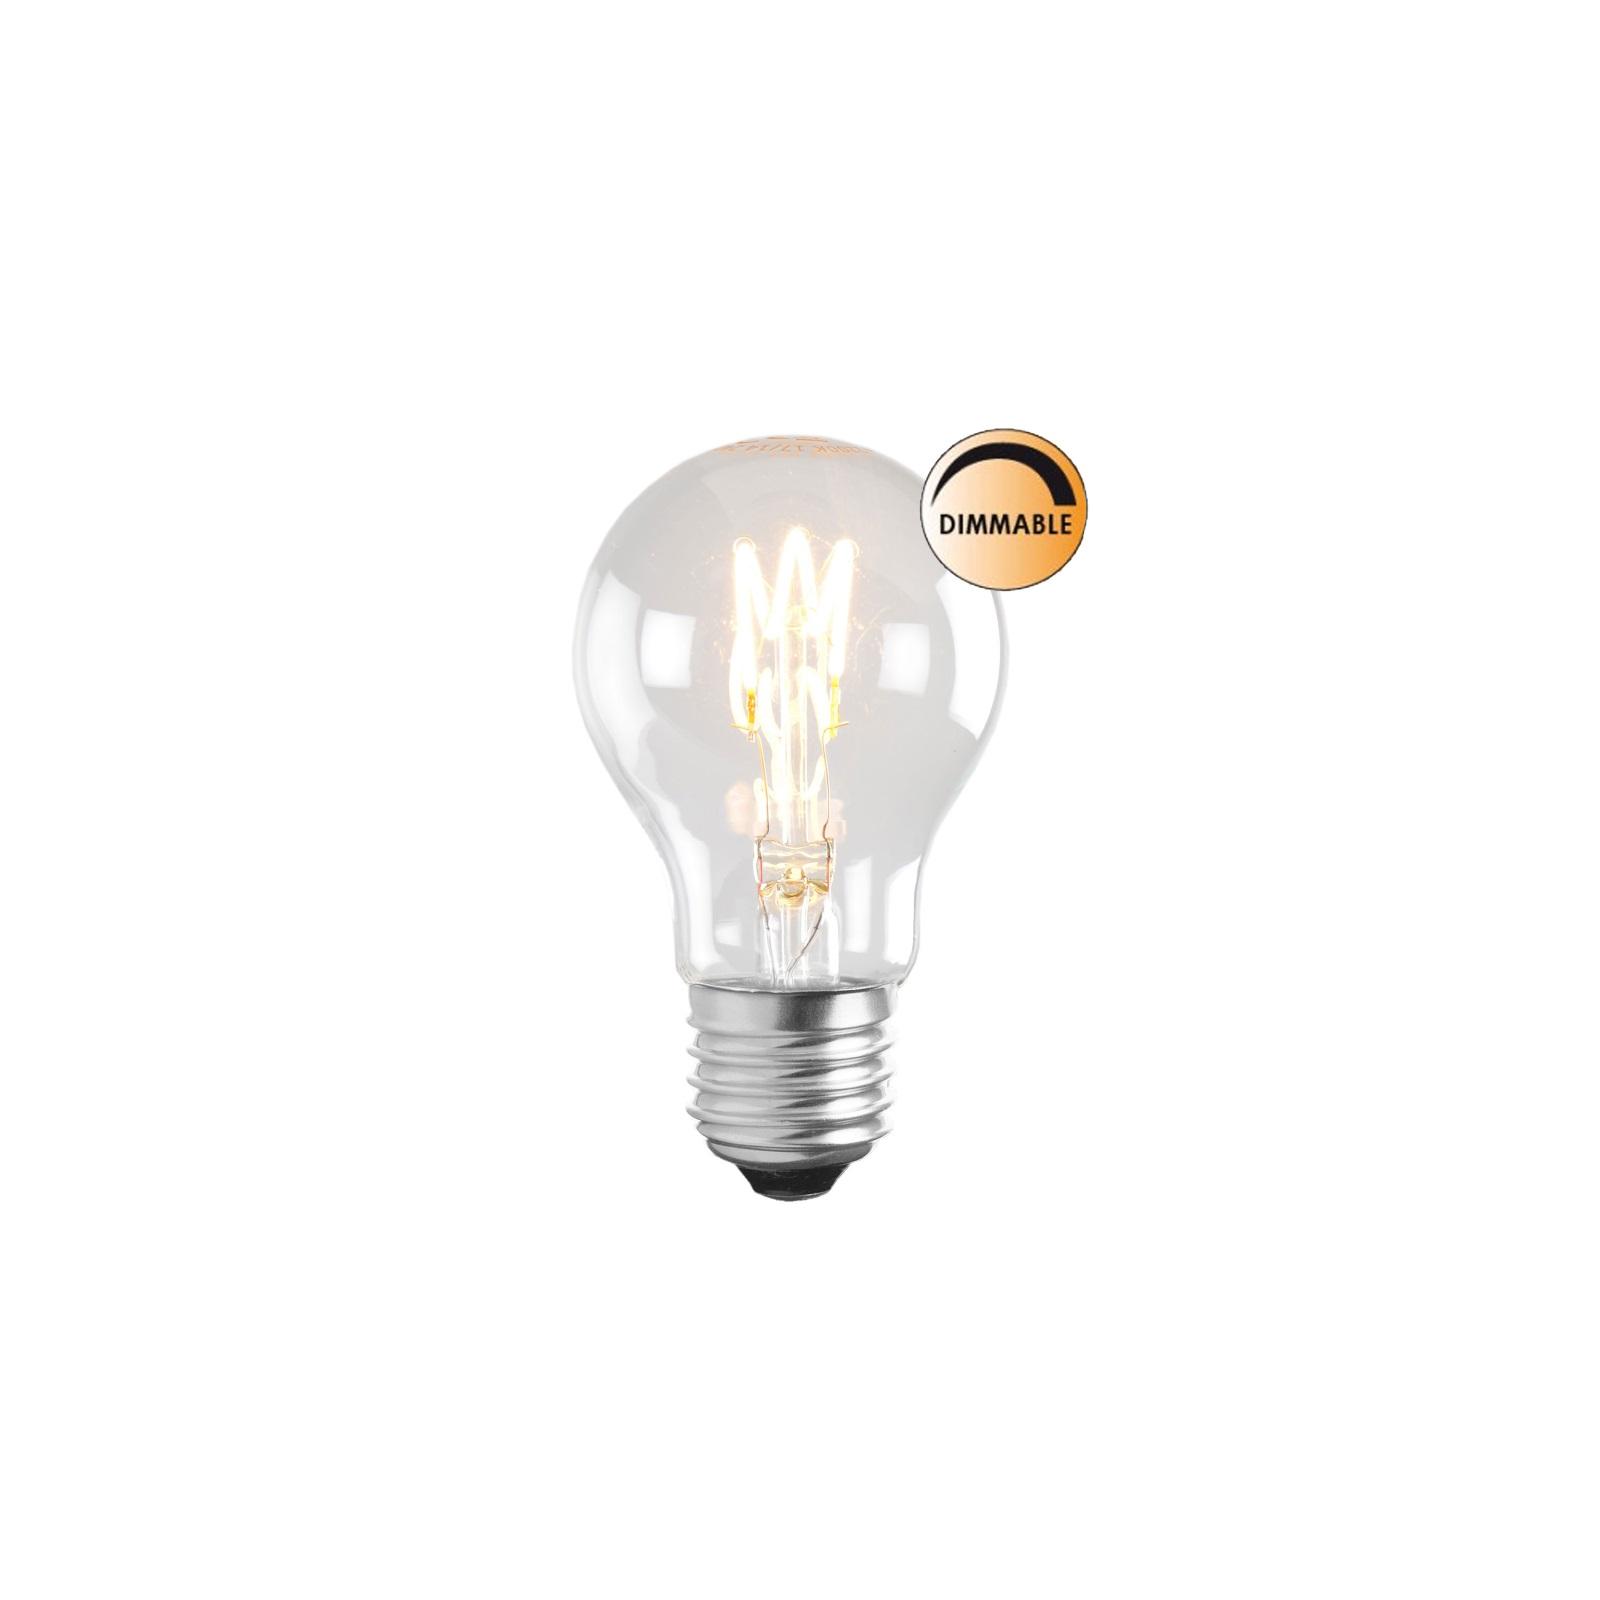 Dimbar LED lampa L203, Globen Lightning